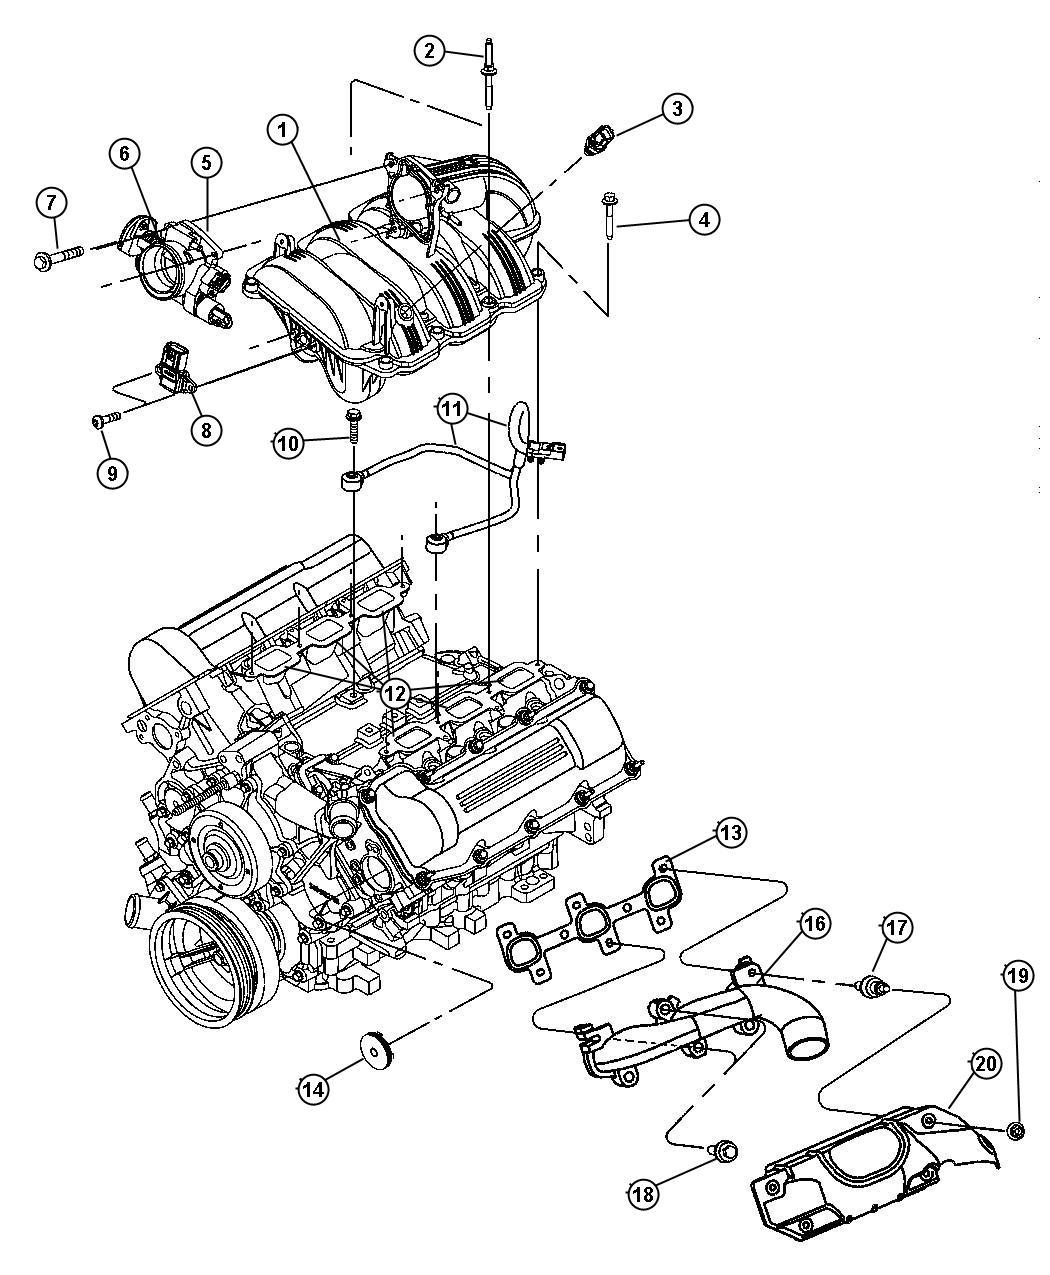 Jeep Wrangler Spark Plug Diagram Html